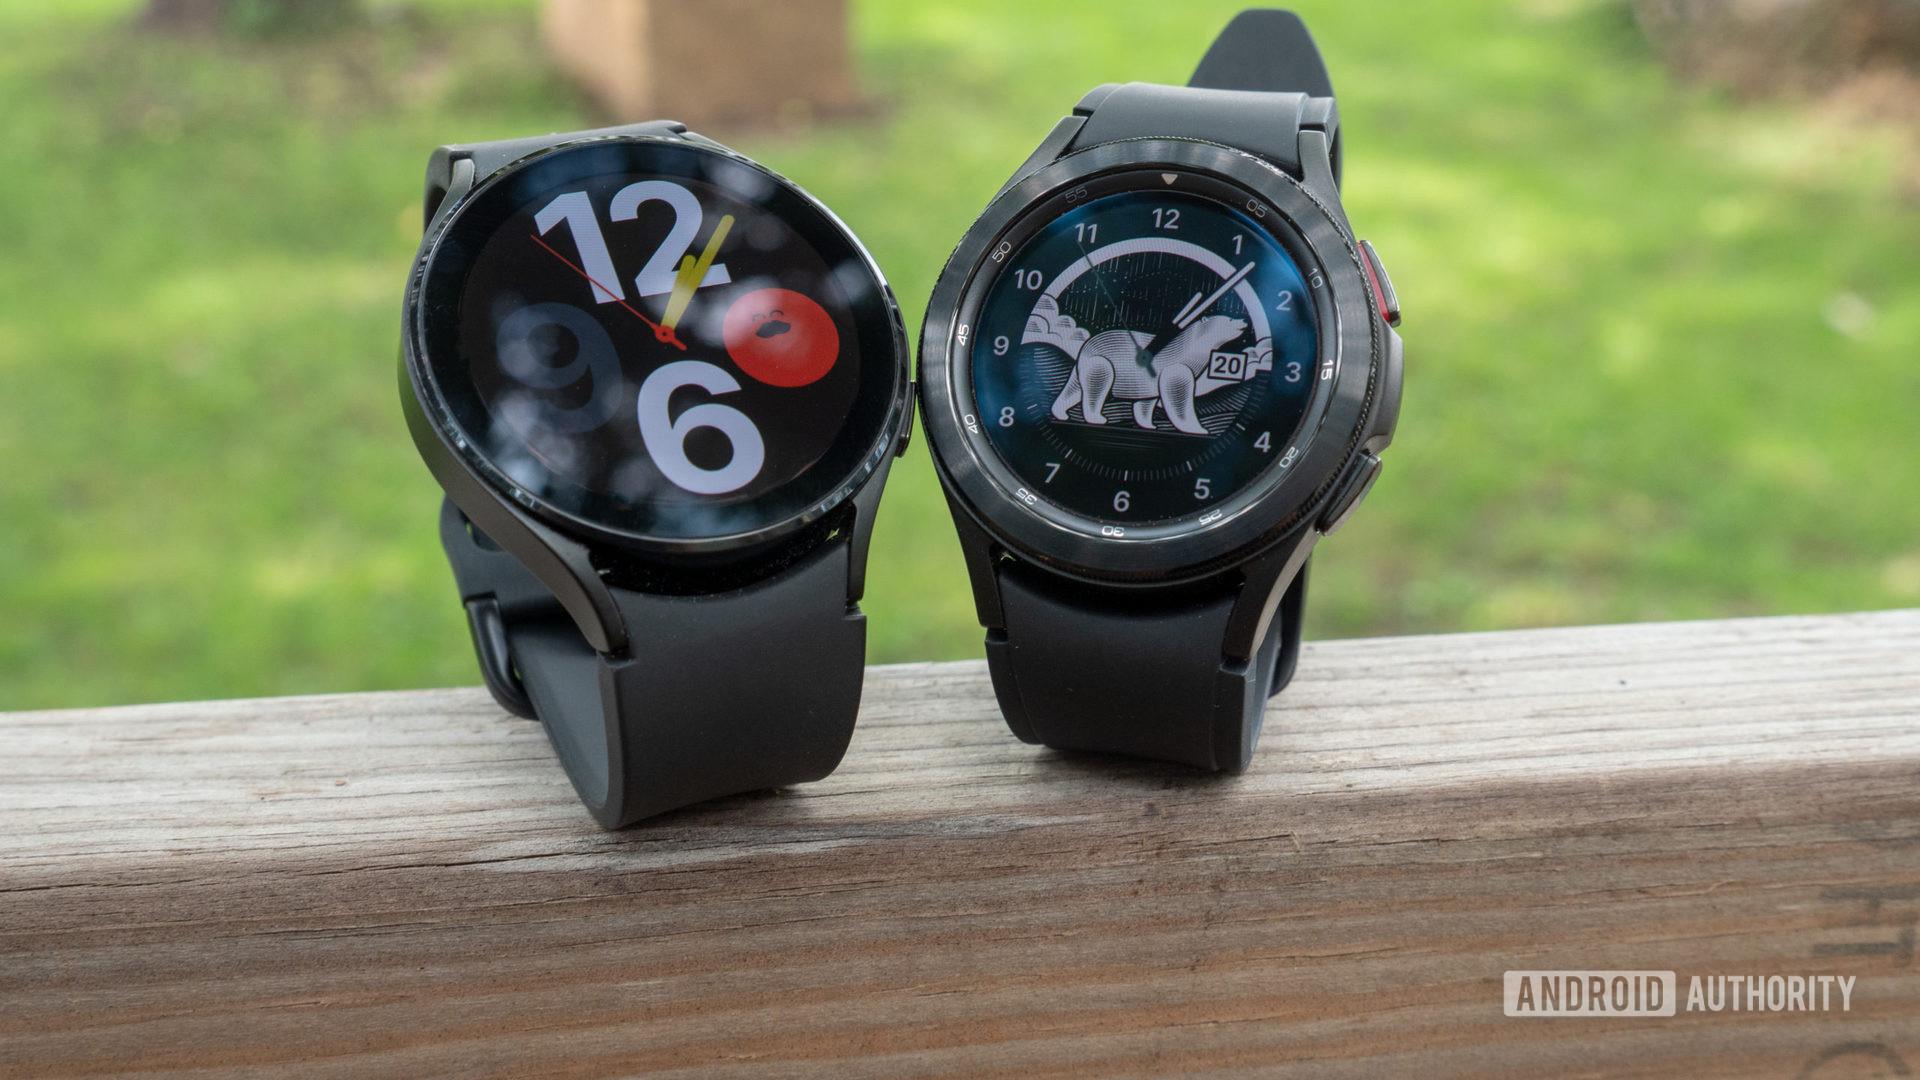 The Samsung Galaxy Watch 4 and Samsung Galaxy Watch 4 Classic on a fence.